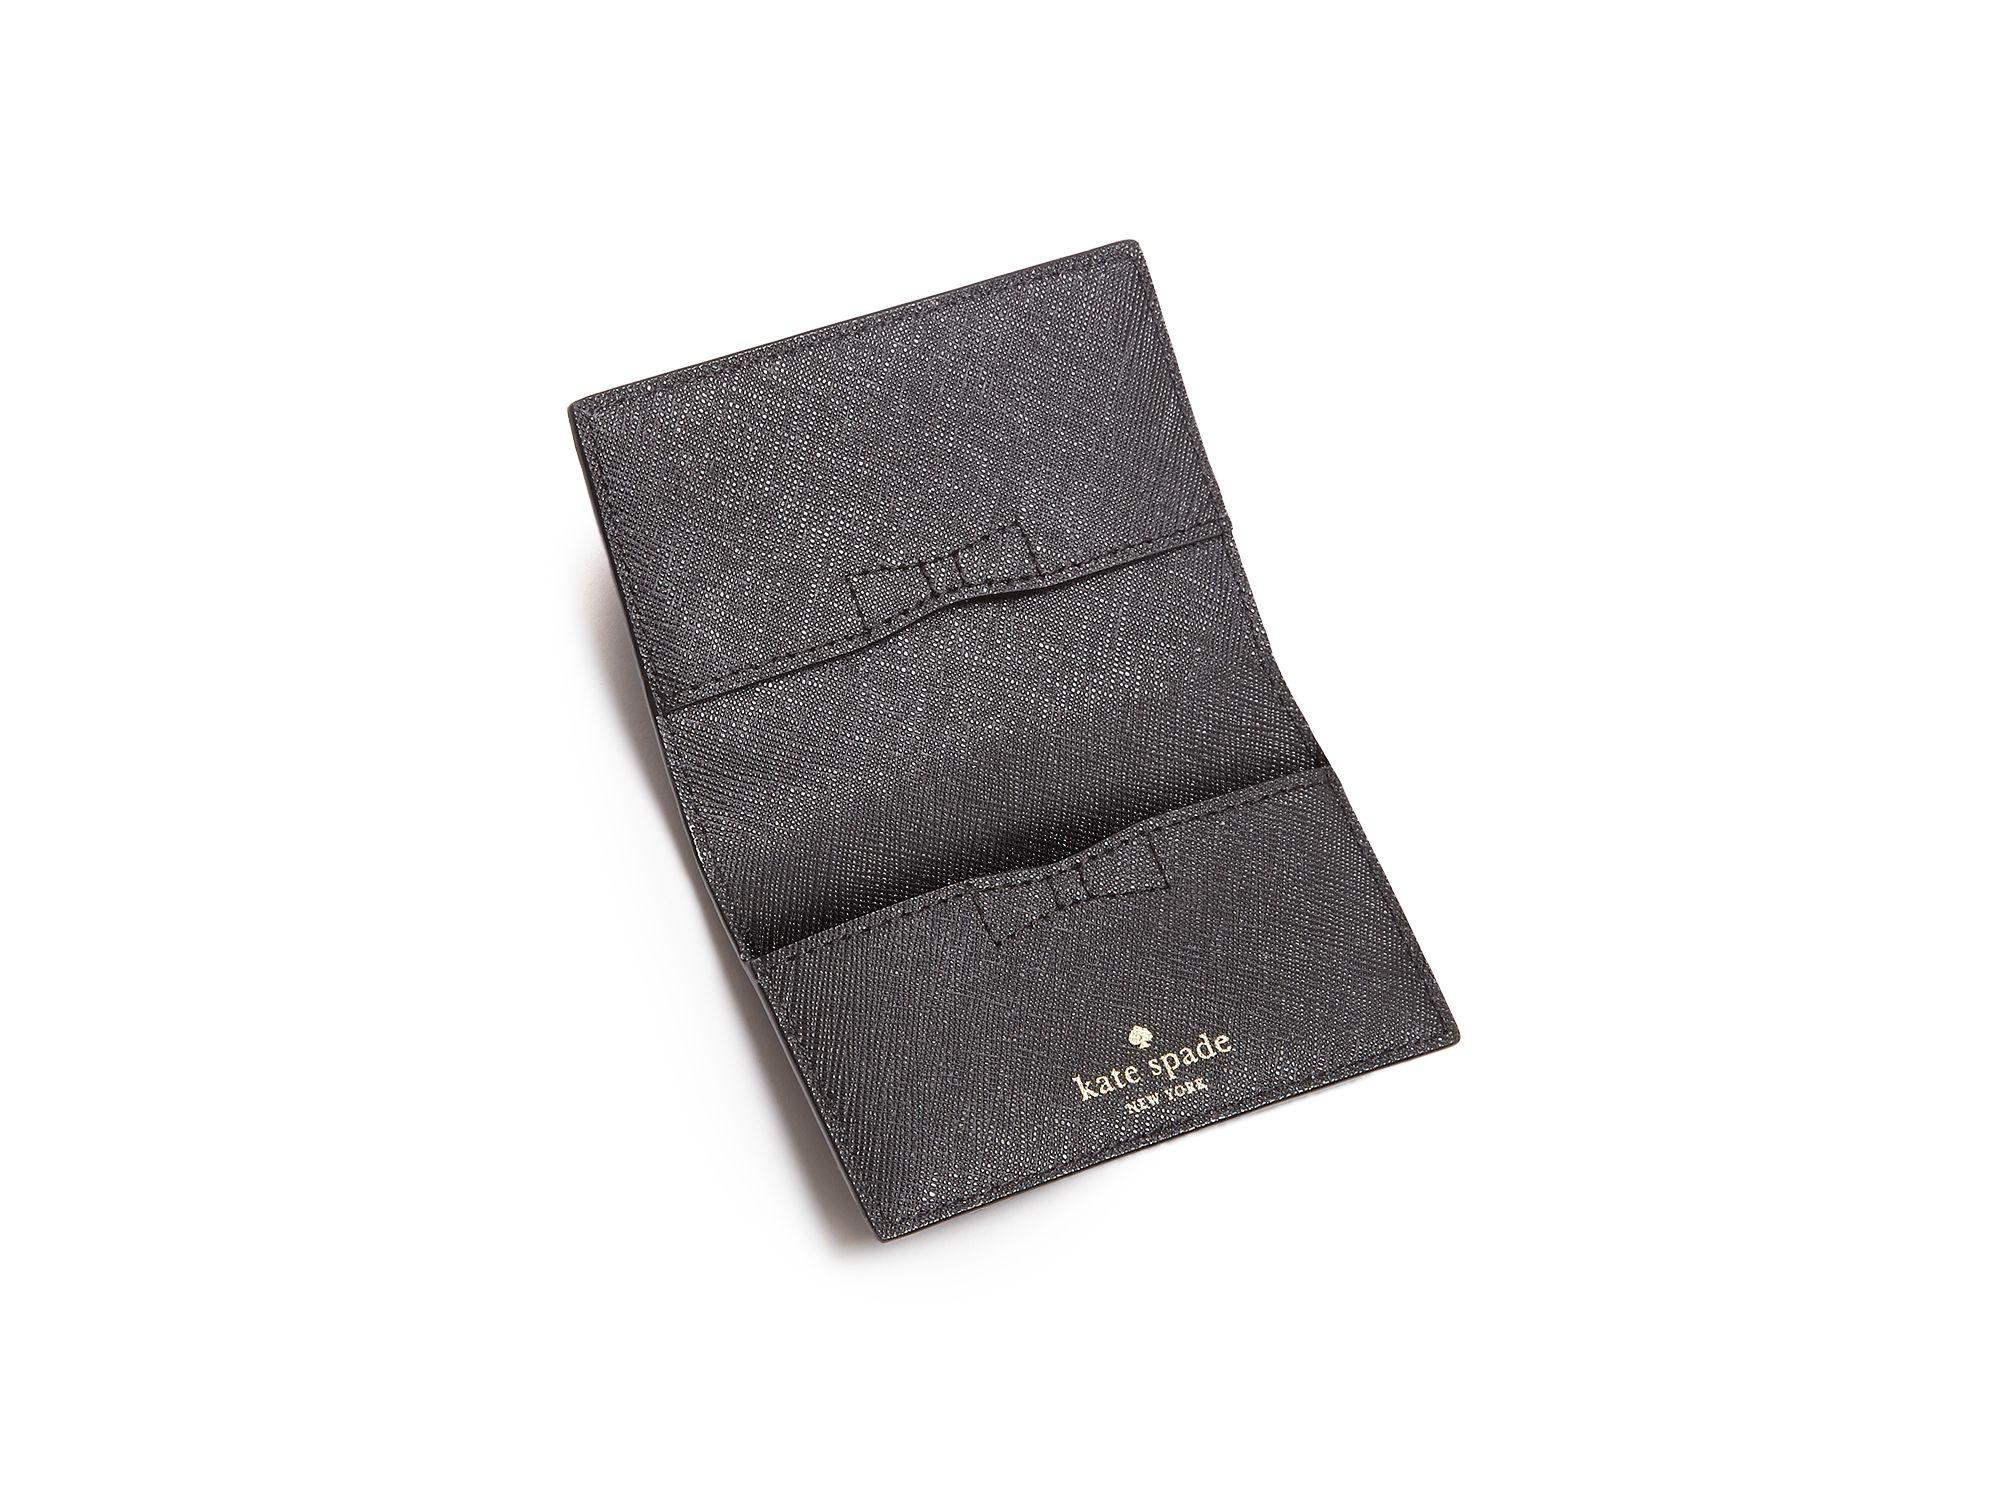 Kate spade new york Cedar Street Melanie Card Case in Black